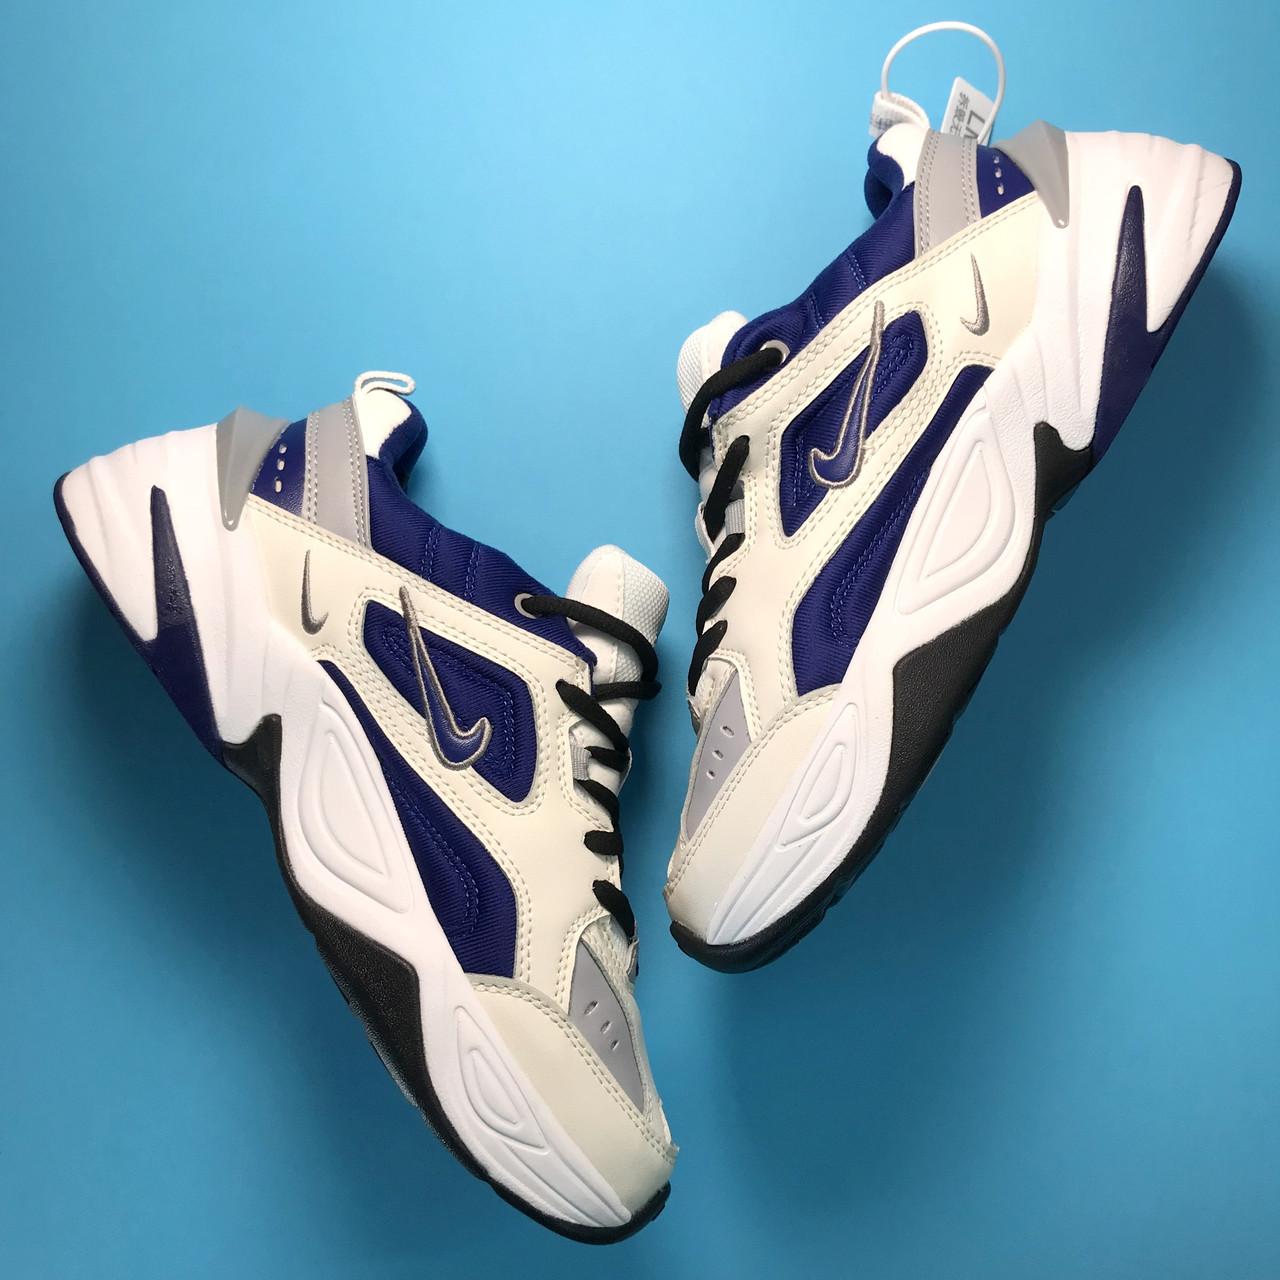 Кроссовки женские Nike M2K Tekno белые-синие (Top replic)